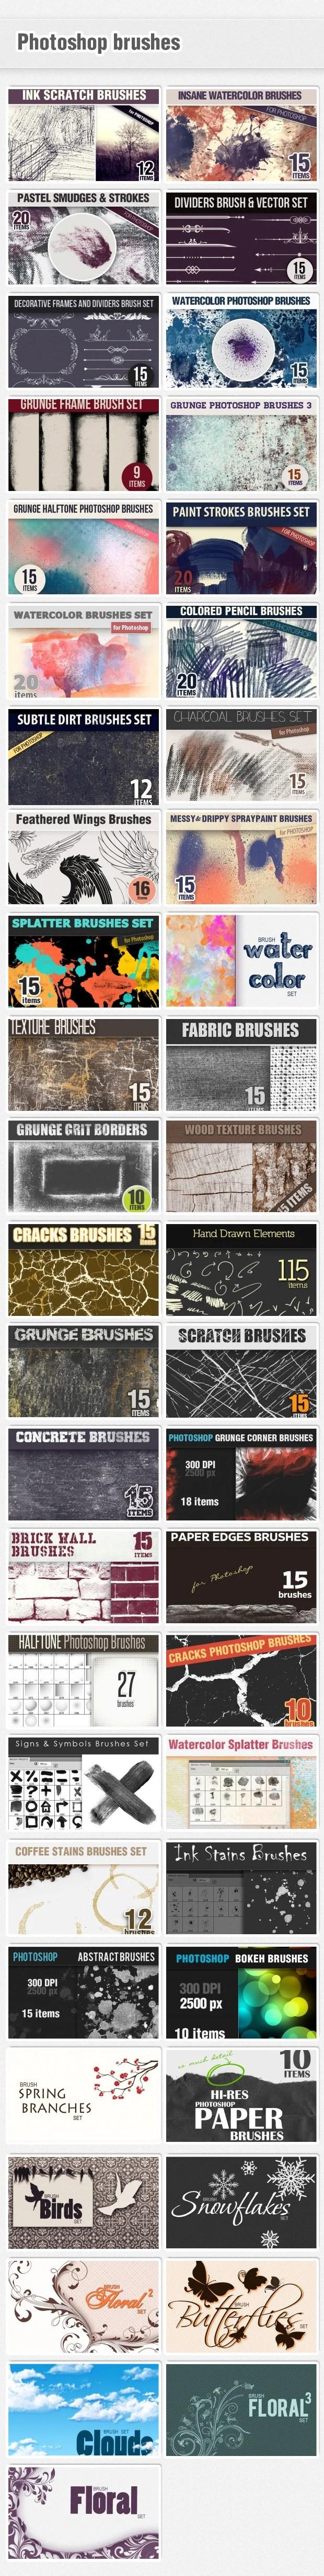 brushes-new